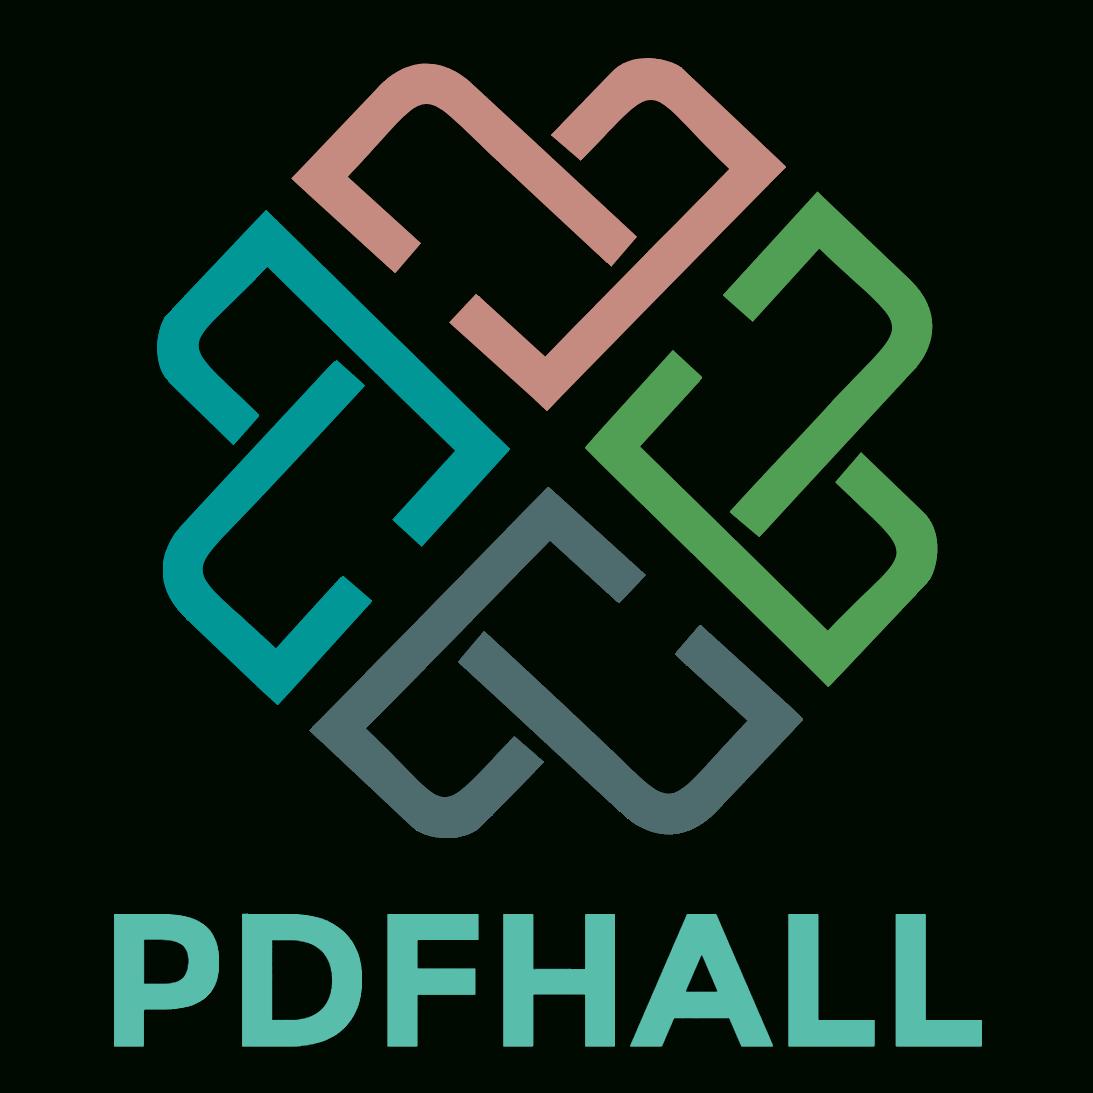 To Download The Pdf File - Interpreter Training Resources avec Sudoku Vierge